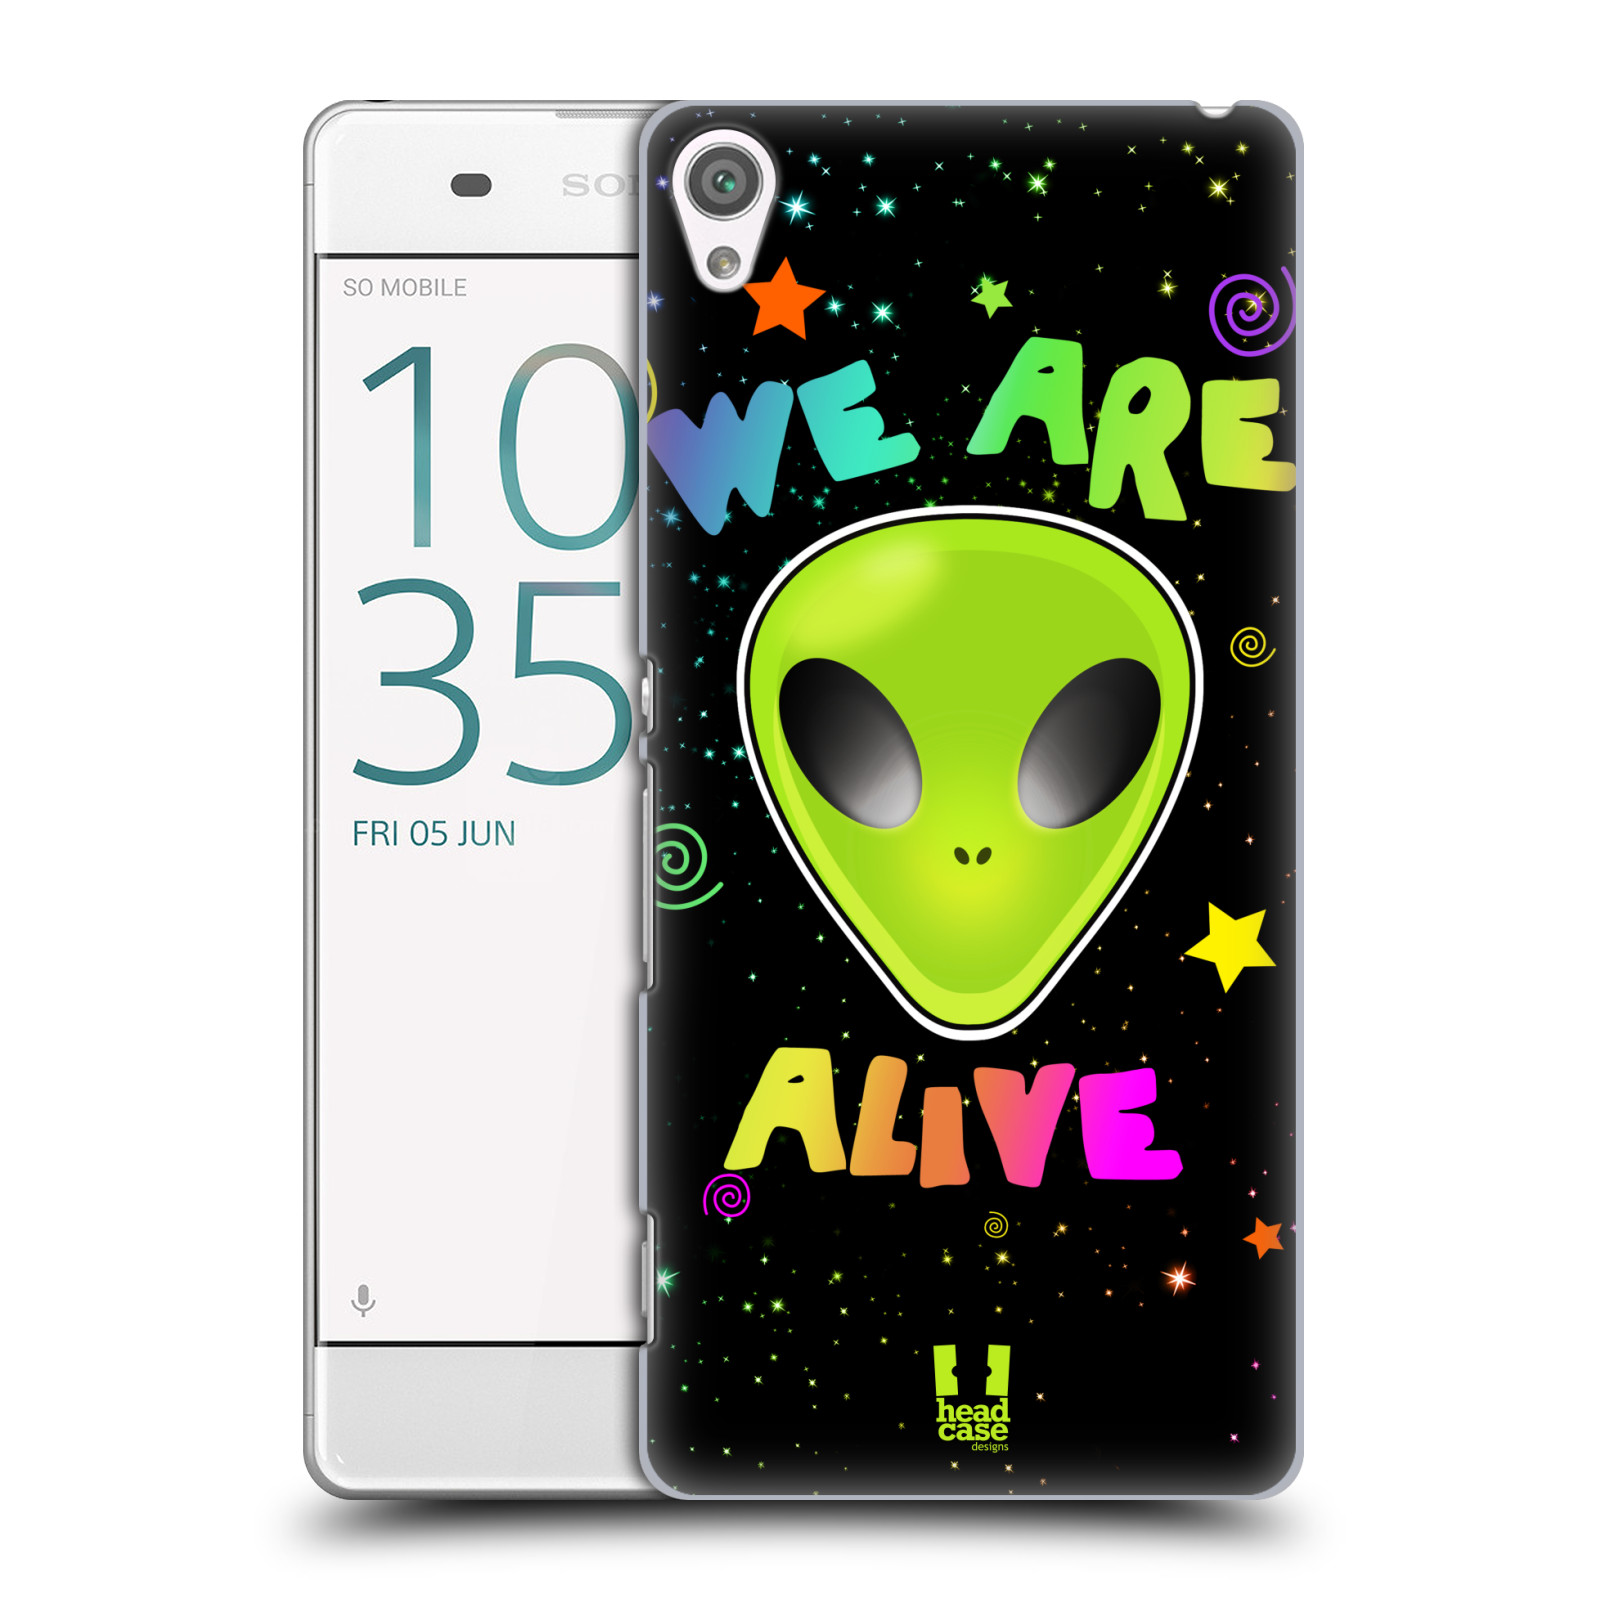 Plastové pouzdro na mobil Sony Xperia XA HEAD CASE ALIENS ALIVE